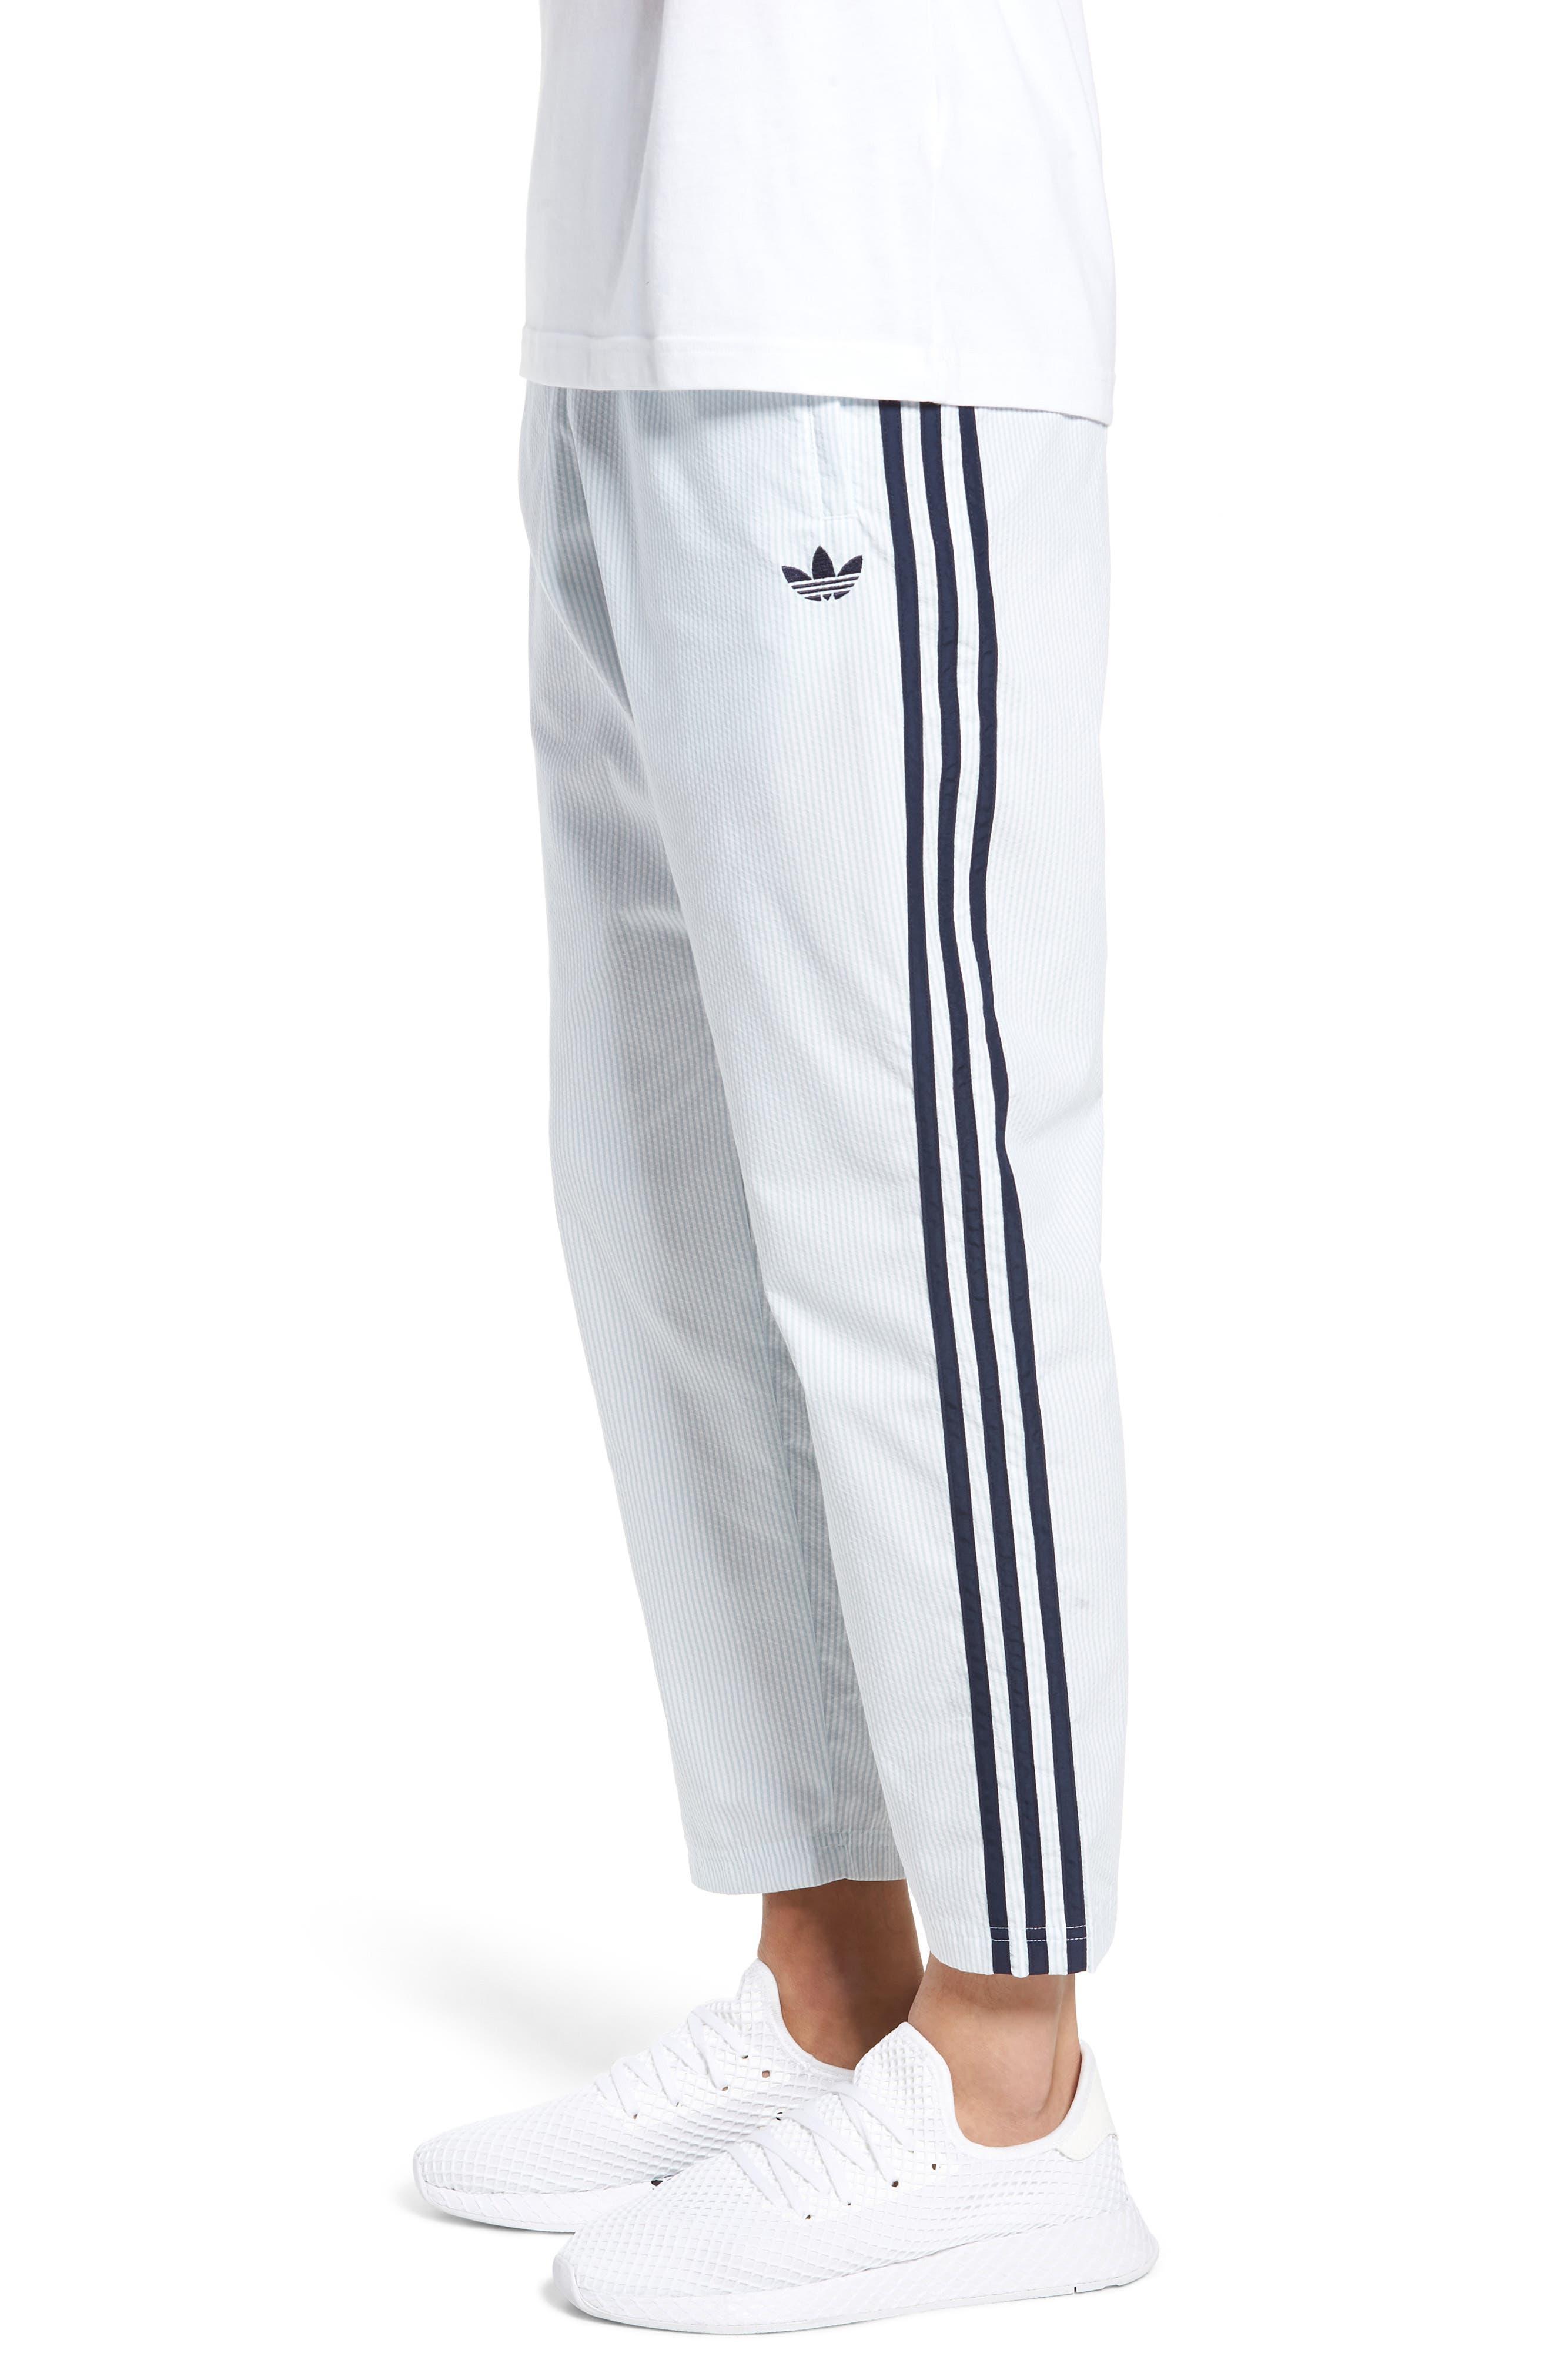 ADIDAS ORIGINALS,                             Seersucker Track Pants,                             Alternate thumbnail 3, color,                             ASH GREY/ WHITE